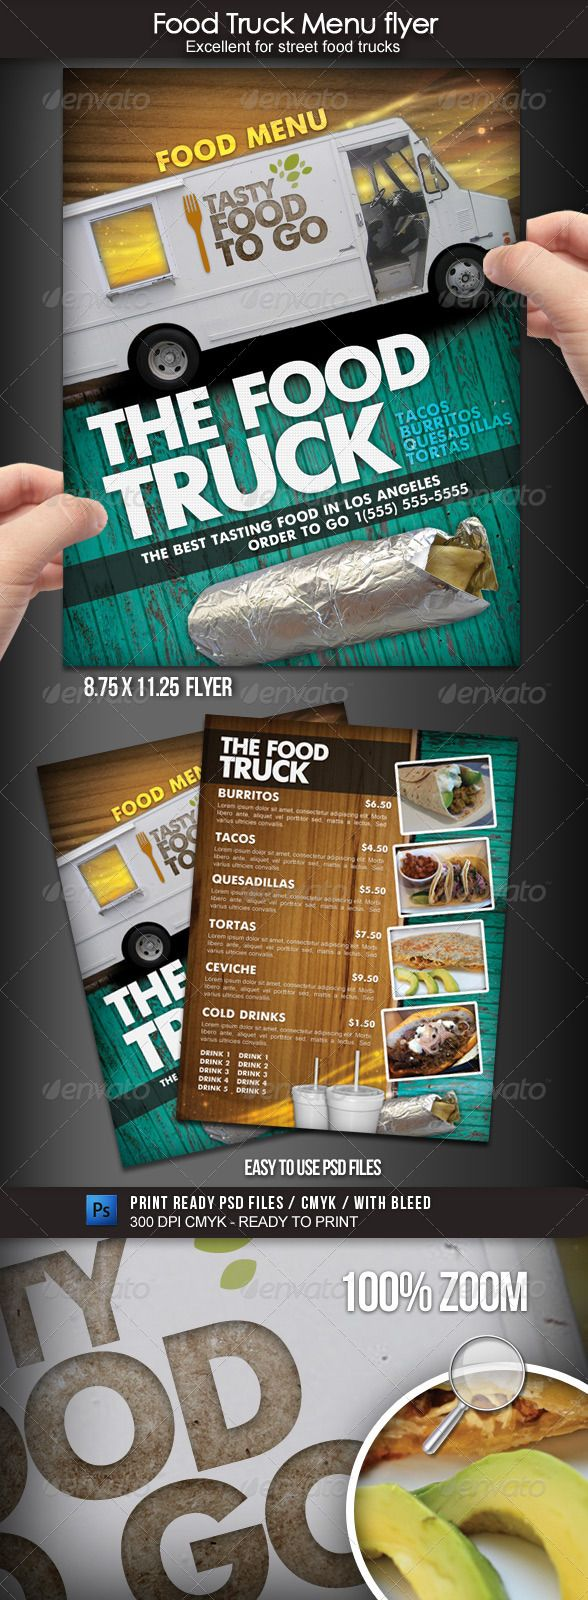 Food Truck Menu Flyer | Food truck menu, Food truck and Print ...